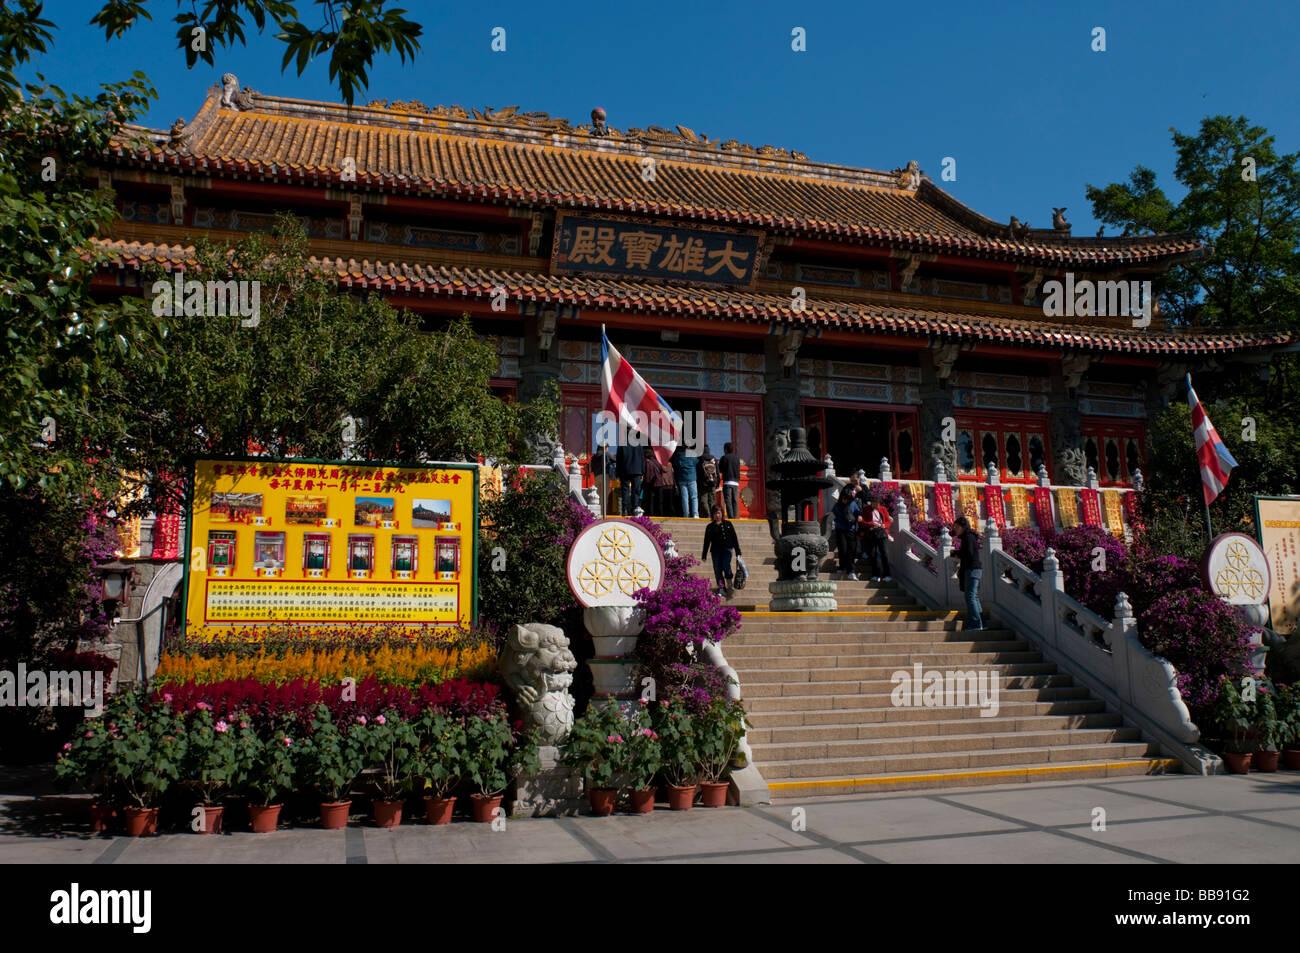 asia china hong kong Lantau Po Lin monastery 2008 - Stock Image